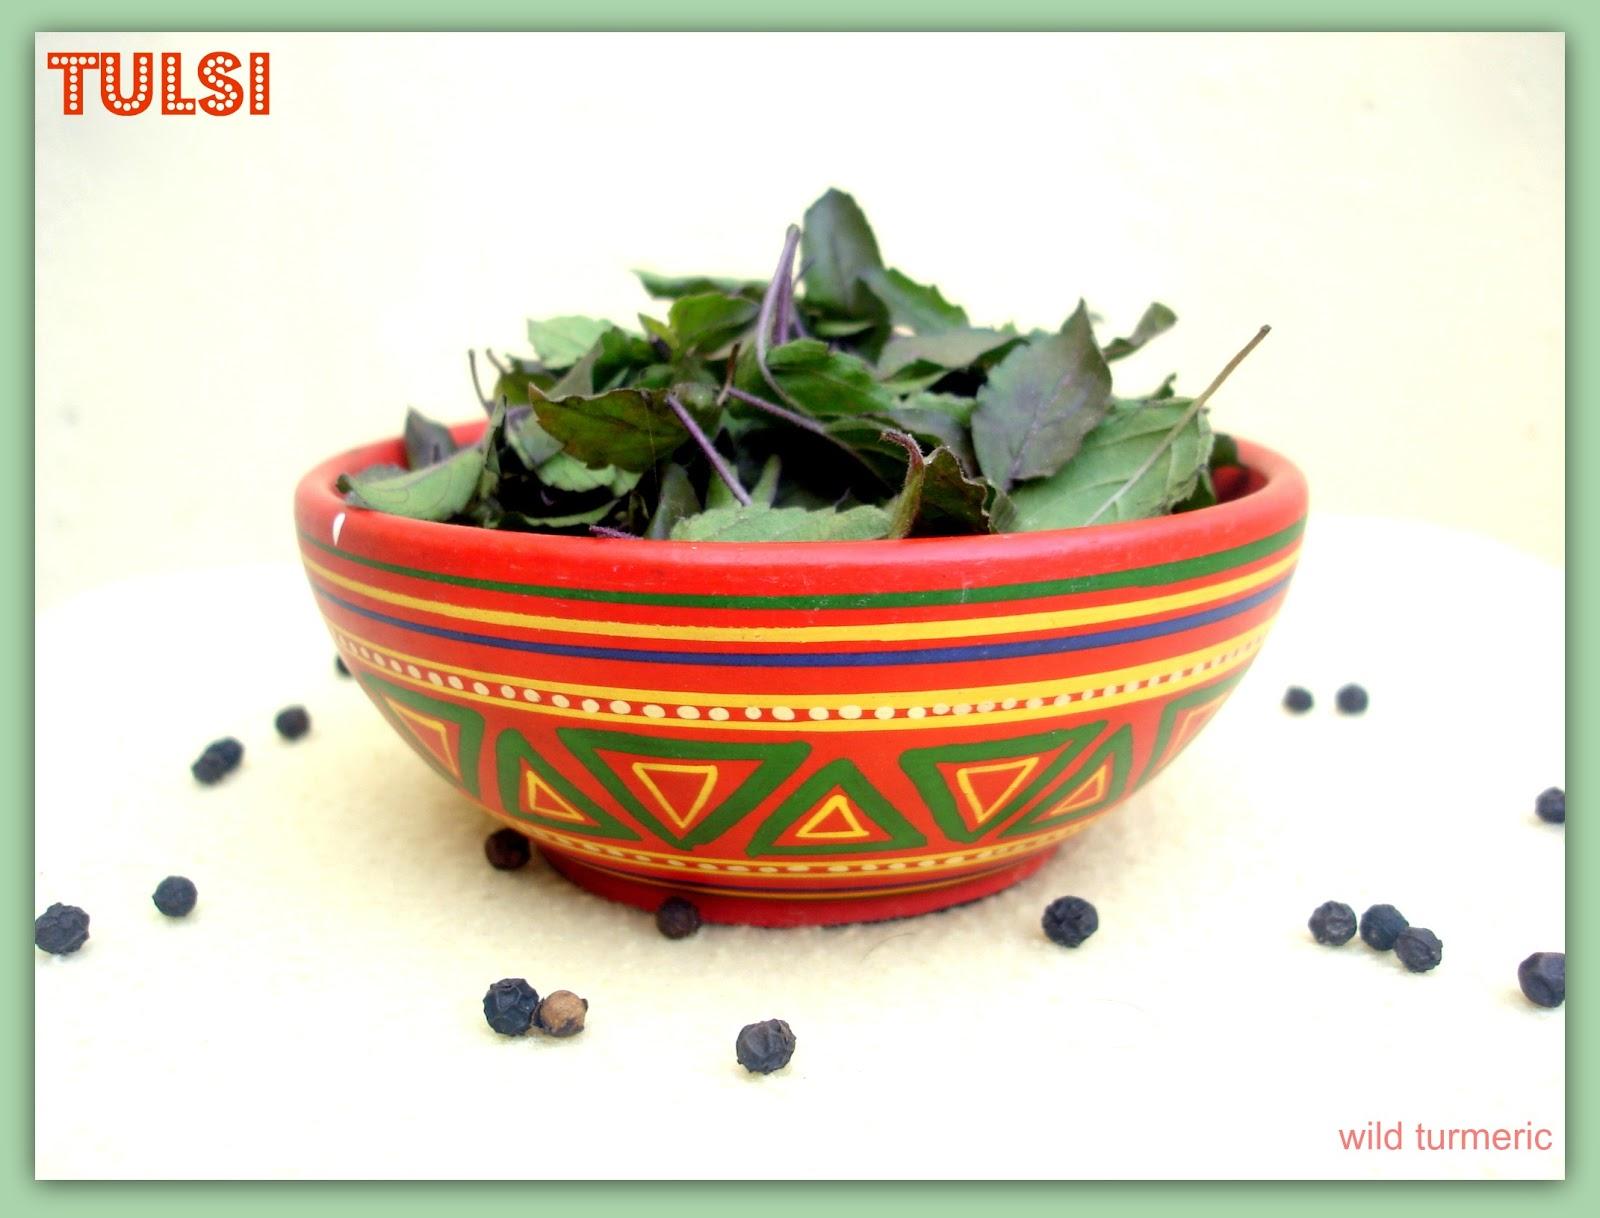 Krishna Tulsi | Thulasi | Tulasi Plant Medicinal Uses: Krishna Tulsi Cough Syrup